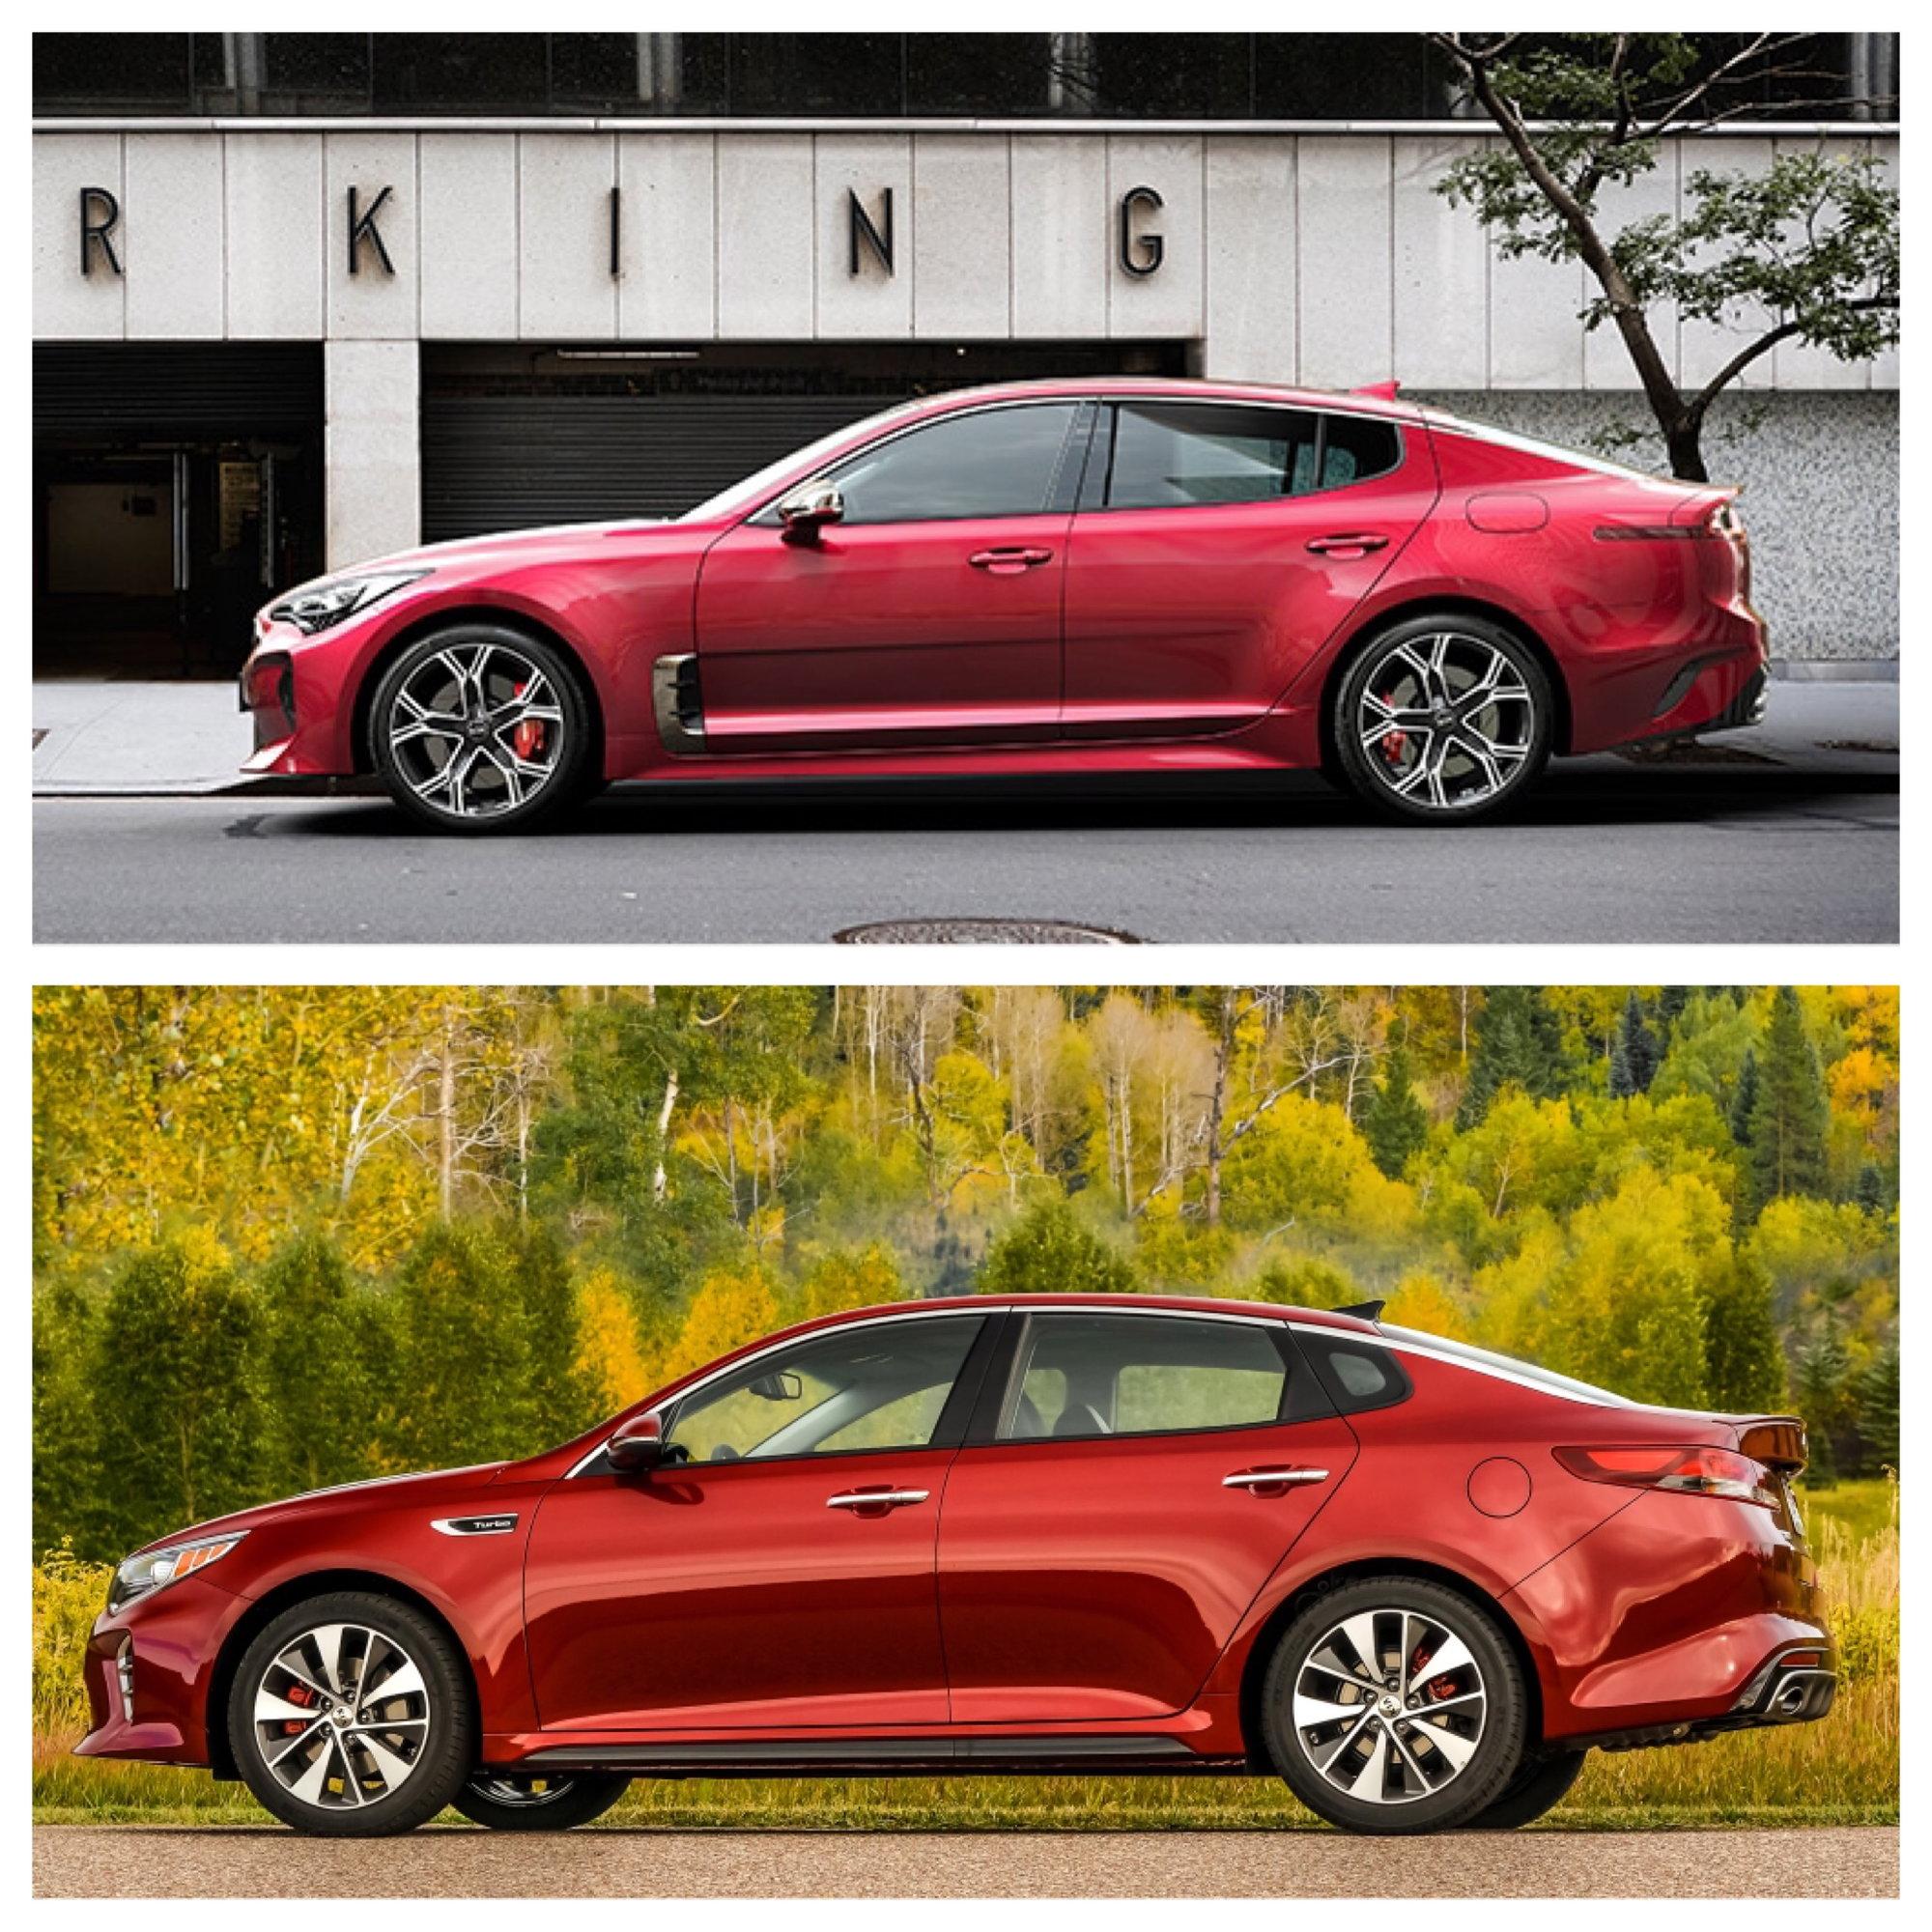 2018 Acura TLX Vs Kia Stinger. Thoughts?